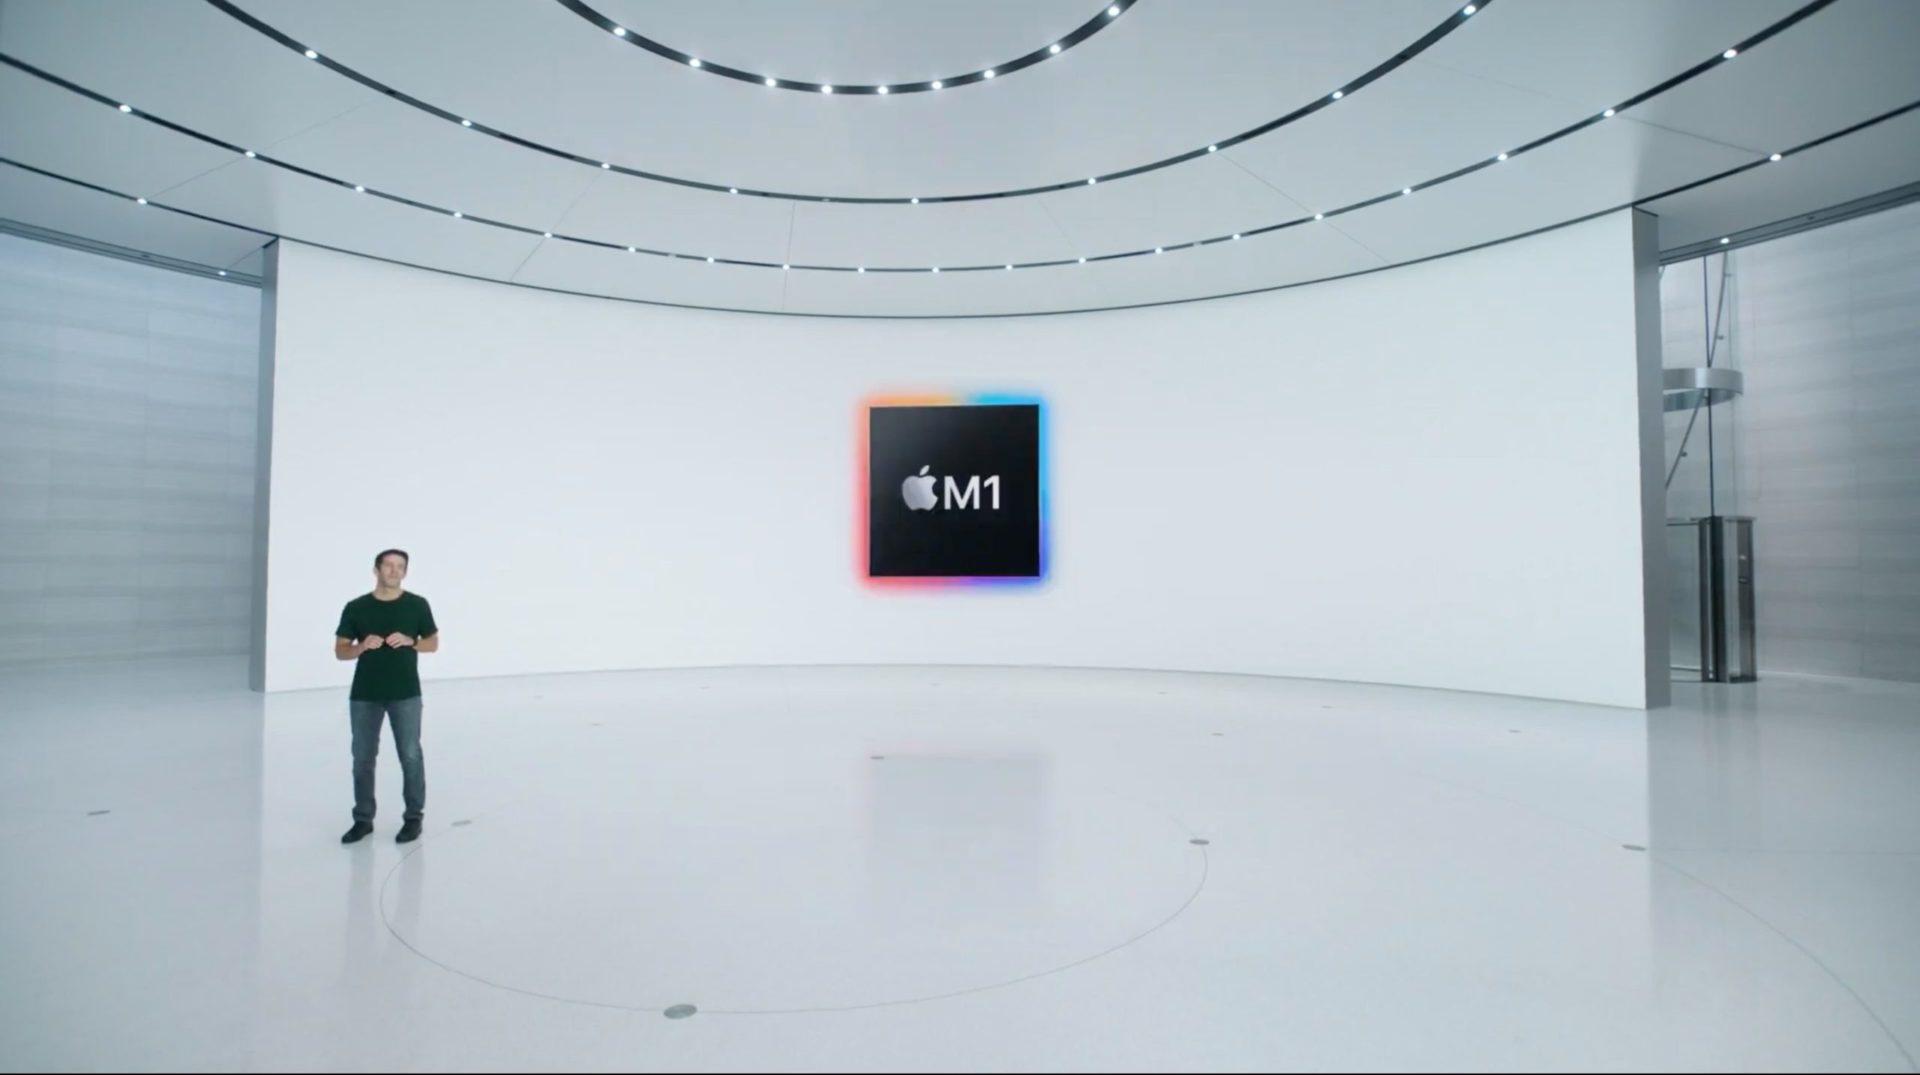 Apple's New M1 SOC